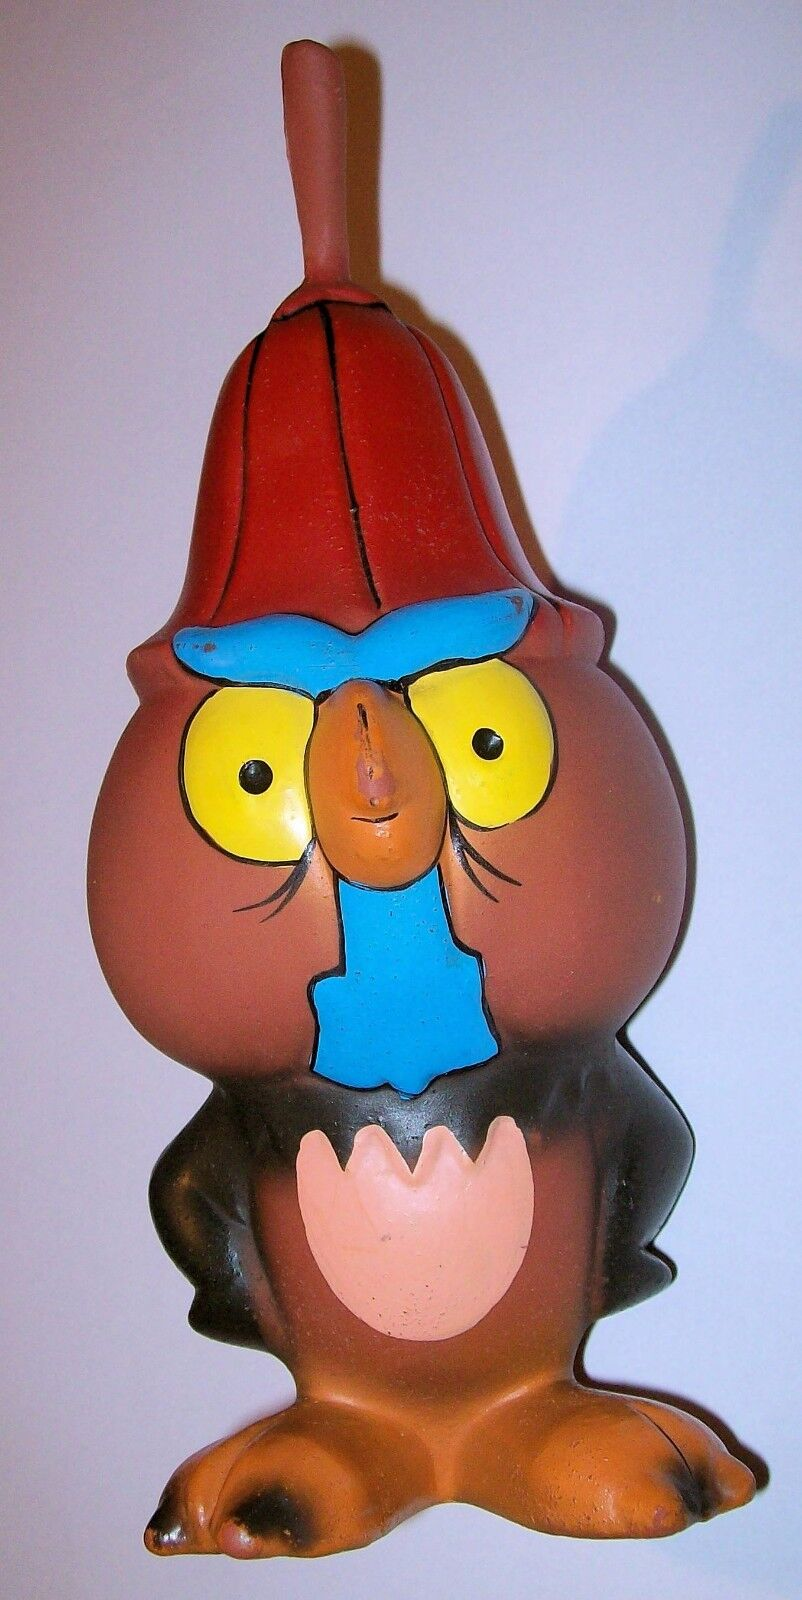 Ozzy Grga - The Little Flying Bears Cartoon Character - 1990